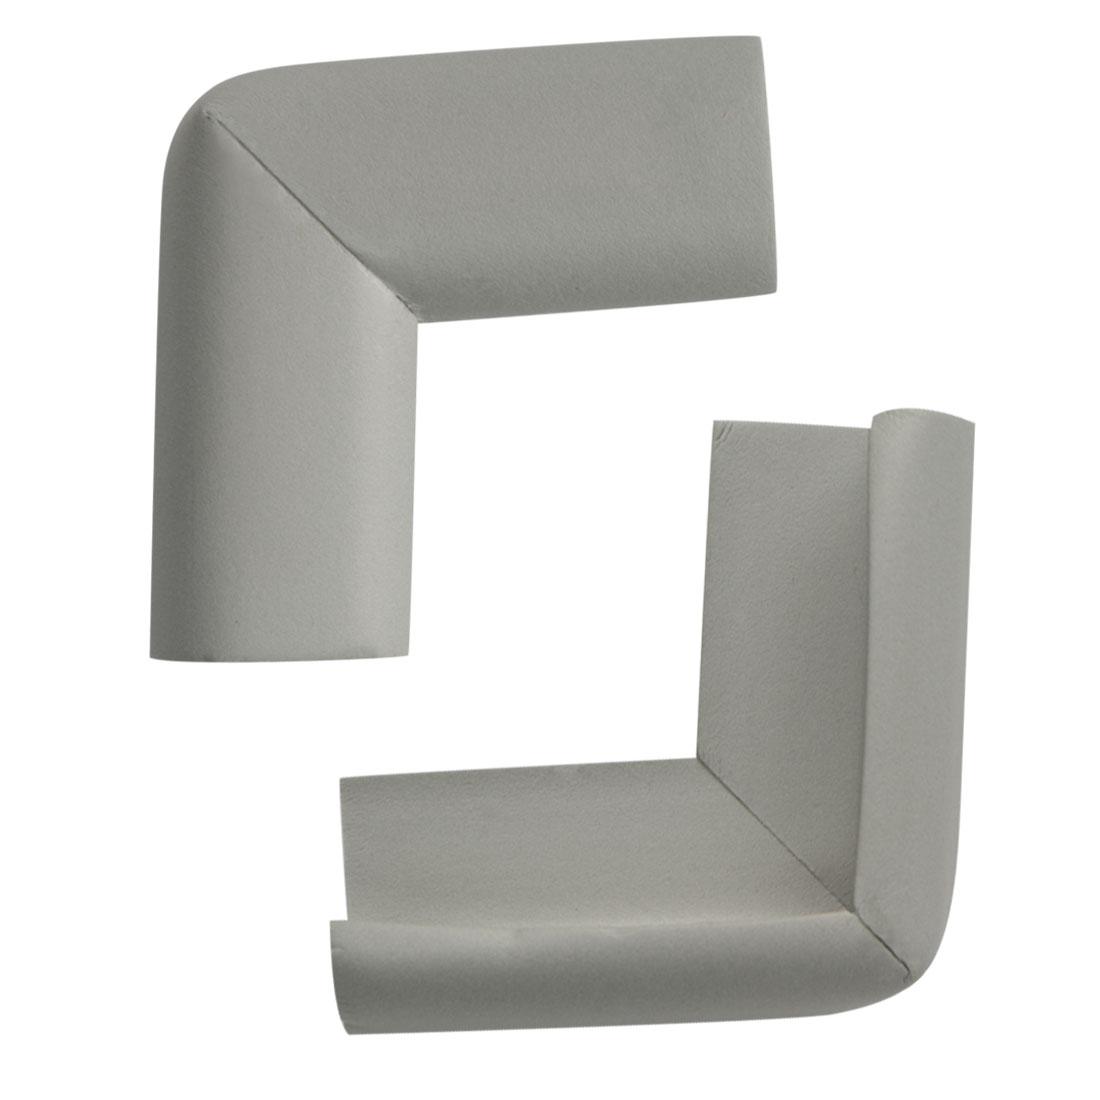 2pcs Furniture Edge Foam Corner Guard Cushion Angle Protector w Self-stick, Grey